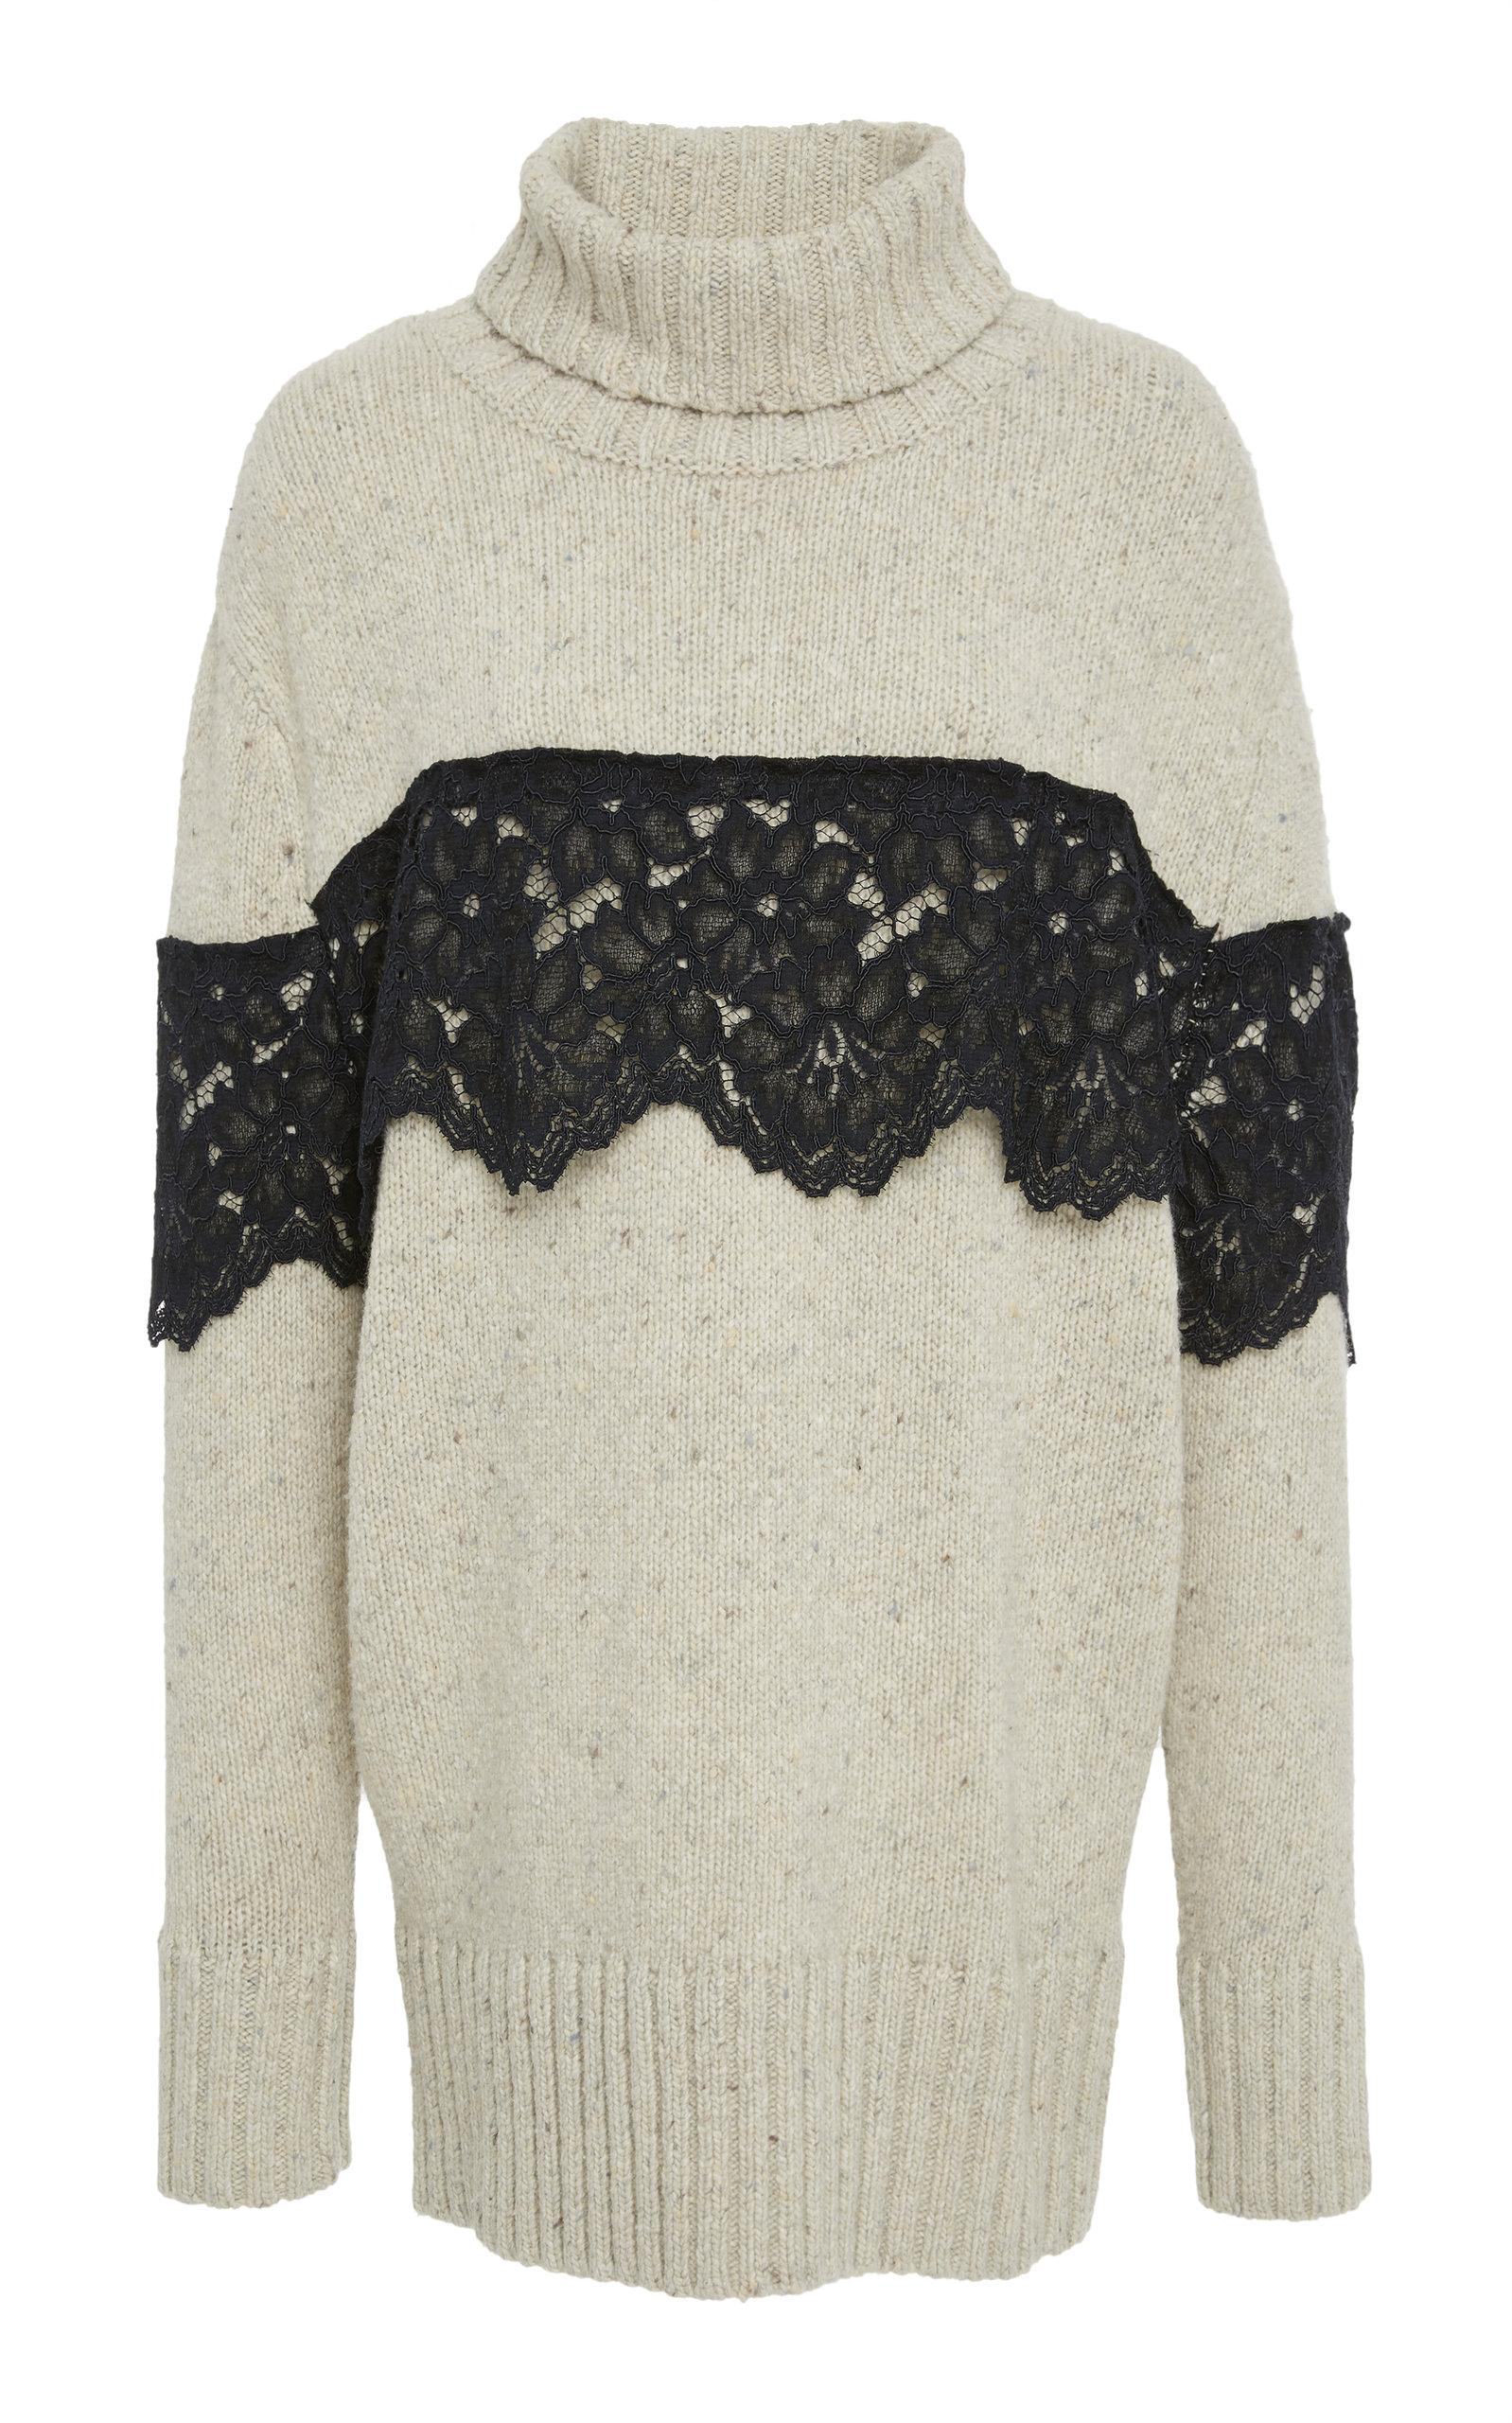 Weston Turtle Neck Pullover in Black/White